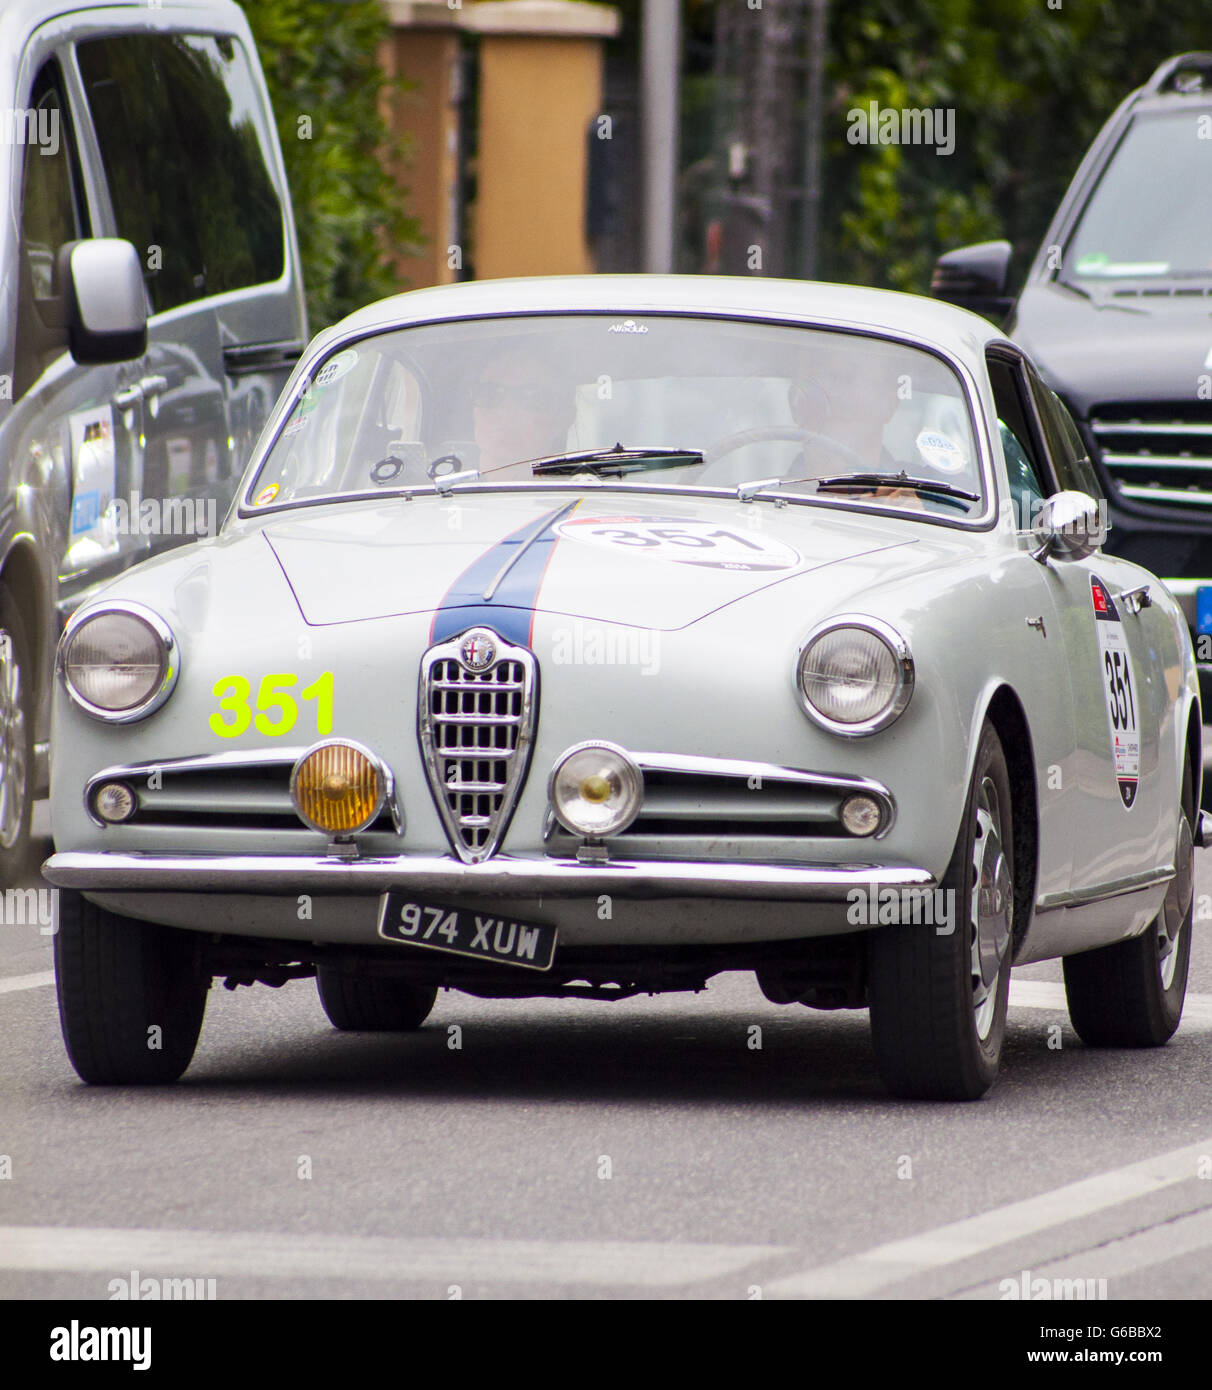 MAY 16: Alfa Romeo Giulietta Sprint Old